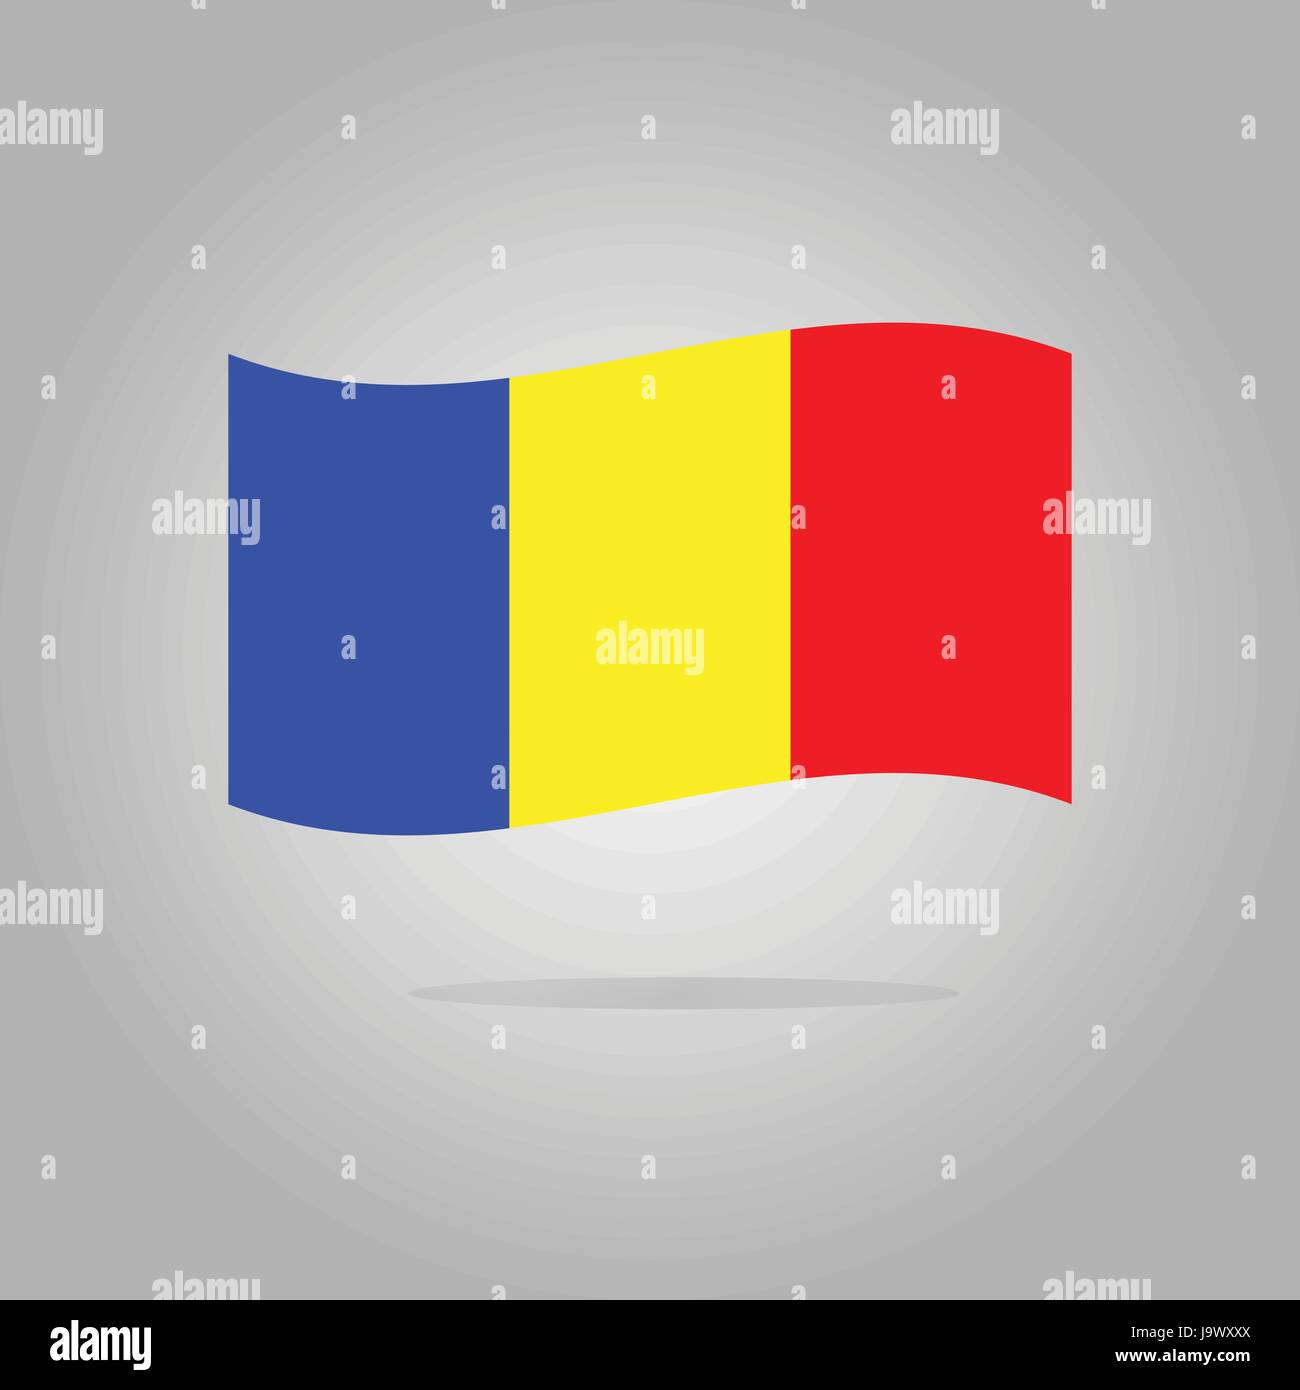 Romania flag design illustration - Stock Image